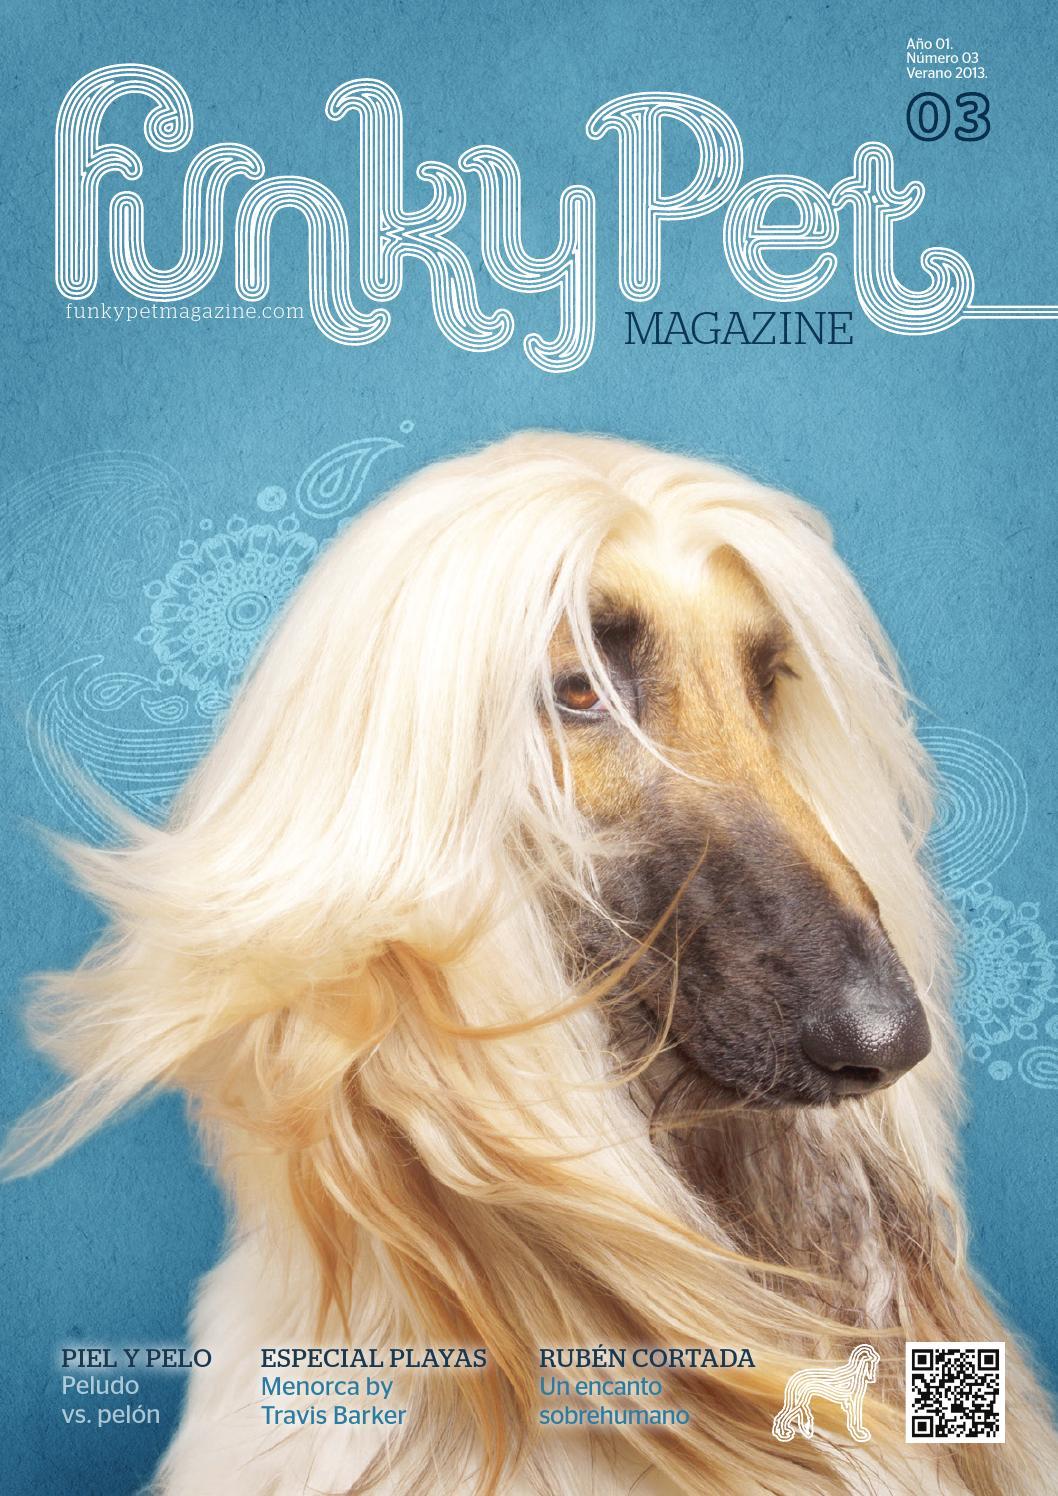 Funkypet magazine 03 by FunkyPet Magazine - issuu